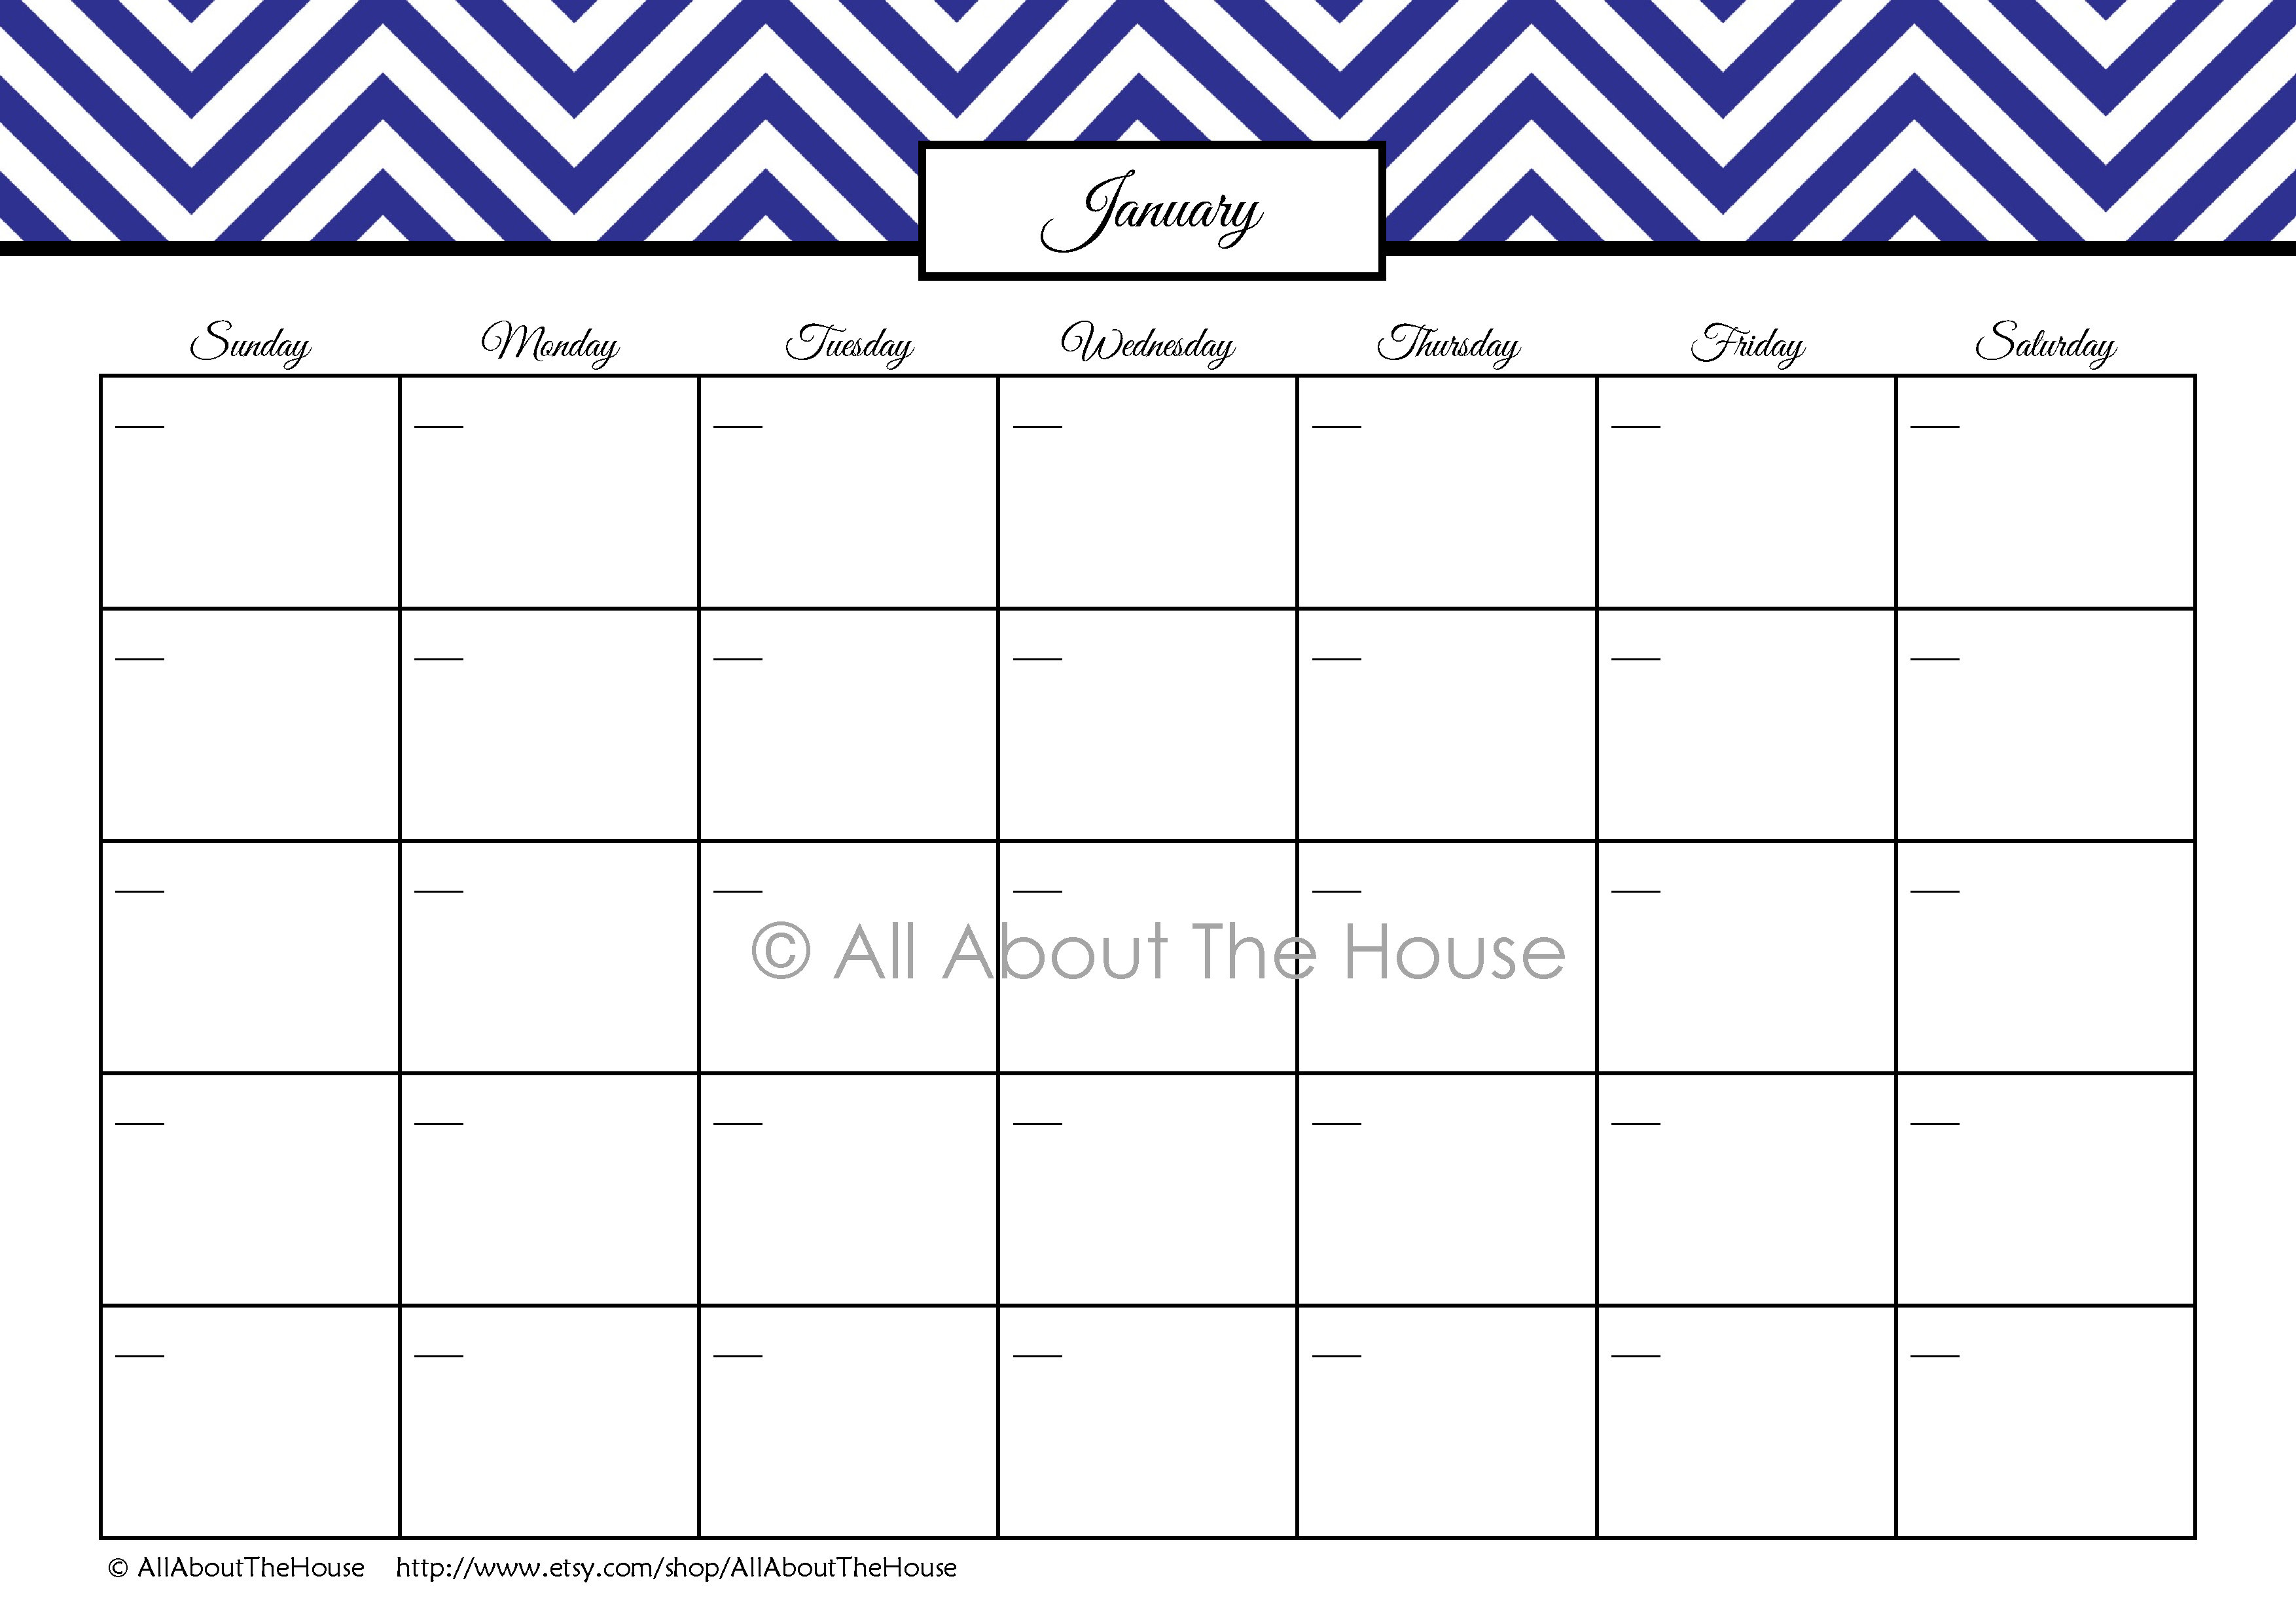 Monthly Calendar I Can Type On : Chevron finance binder set household printables